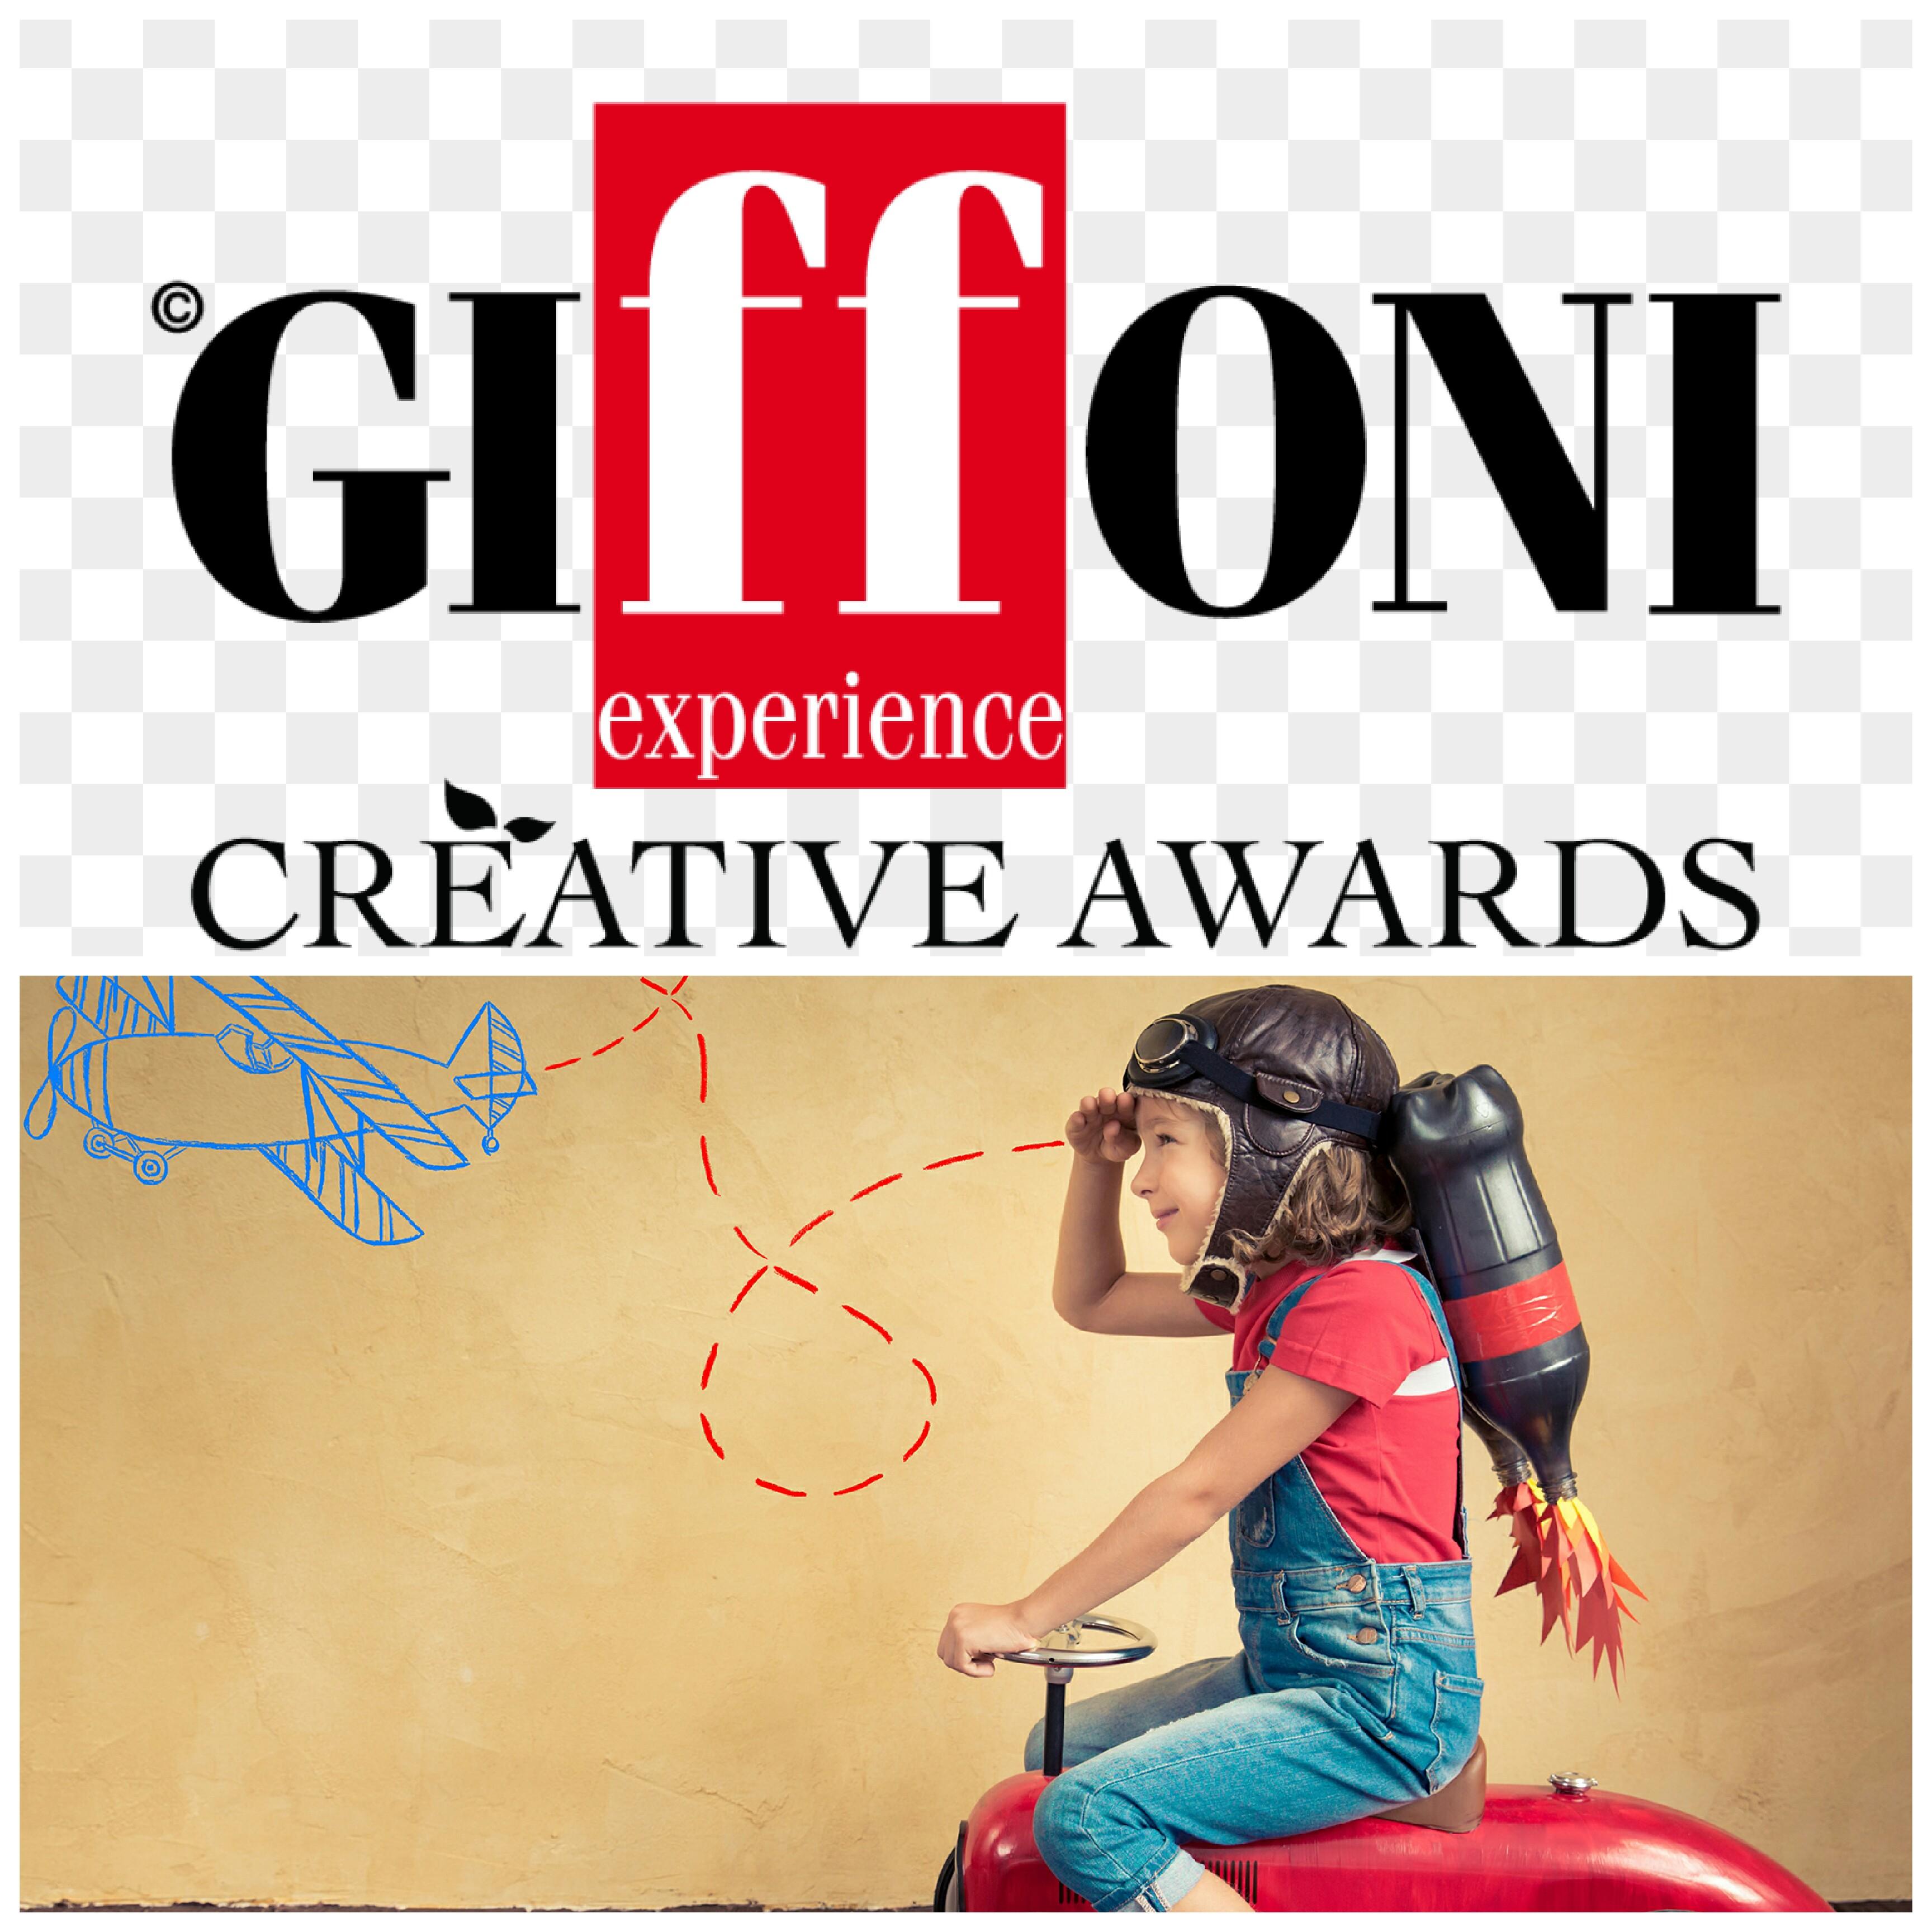 Giffoni creative Awards